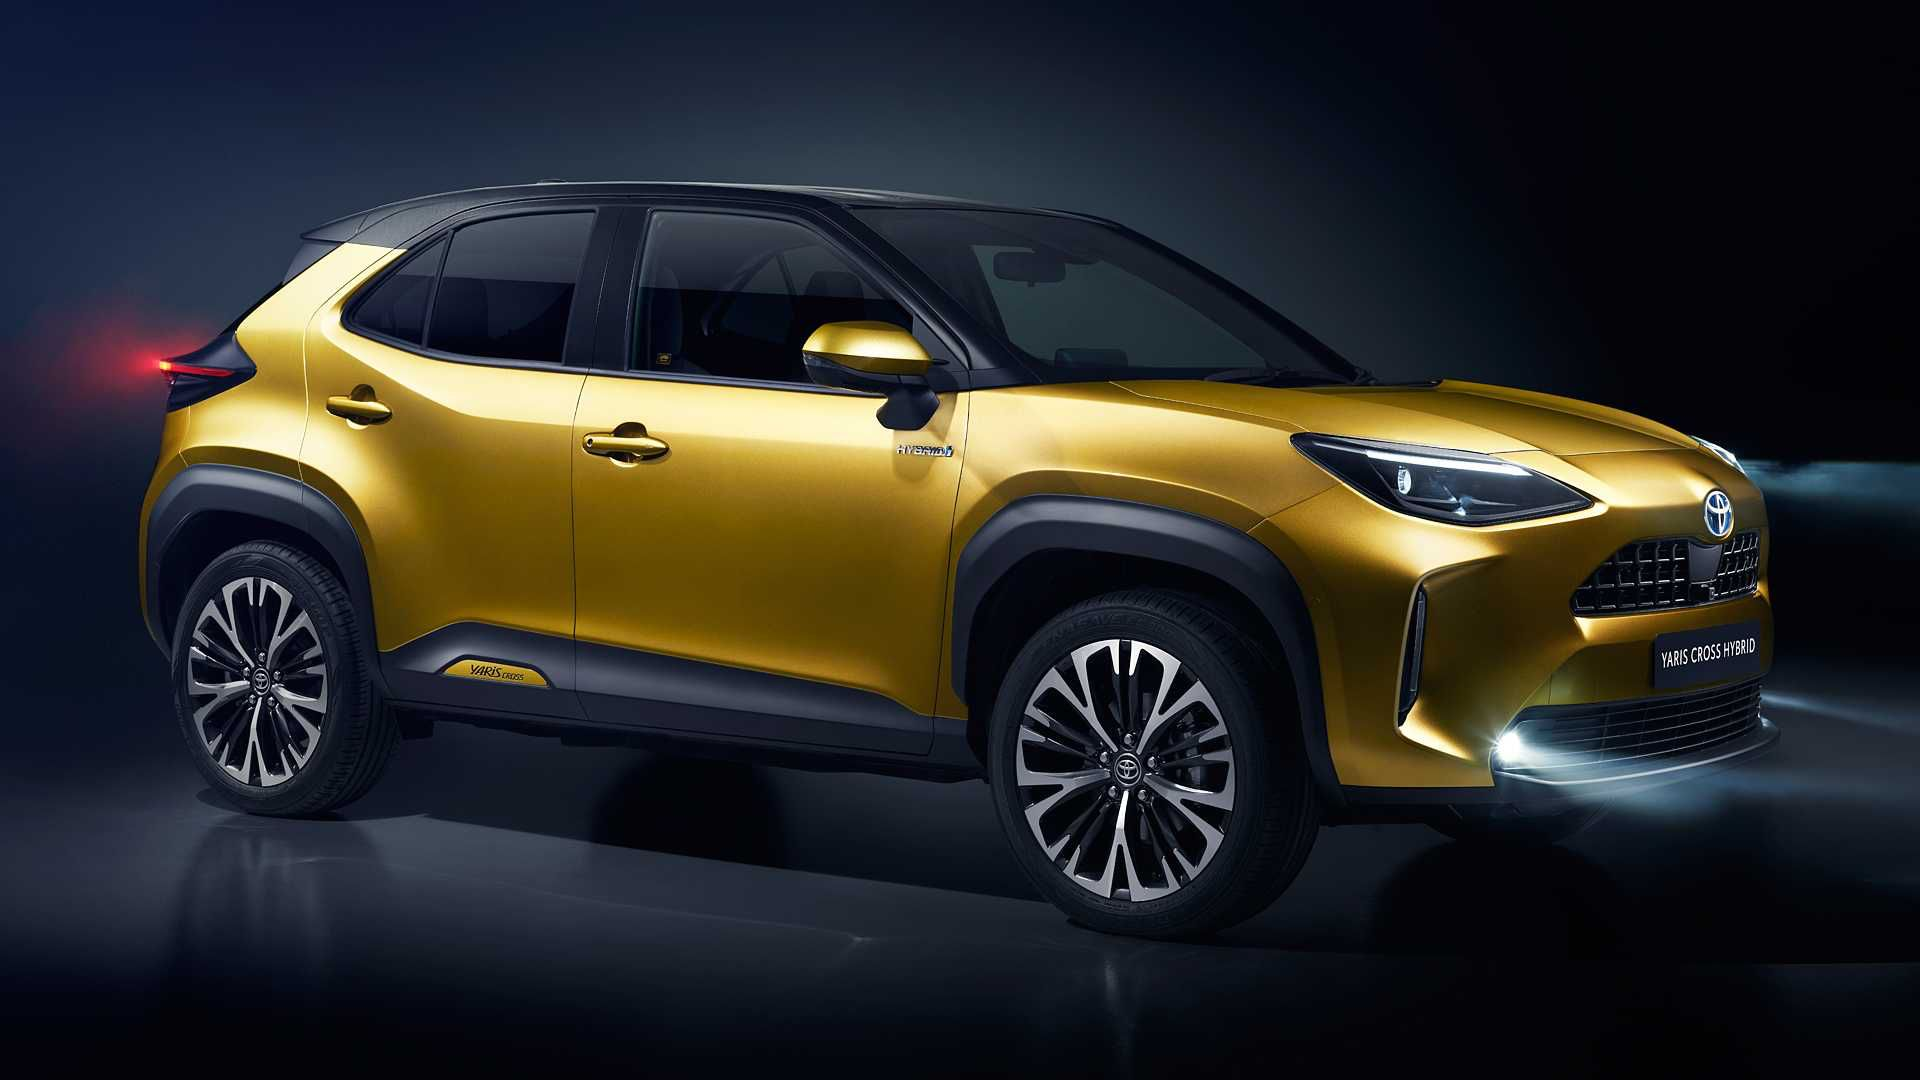 Nuova Toyota Yaris Cross 2021